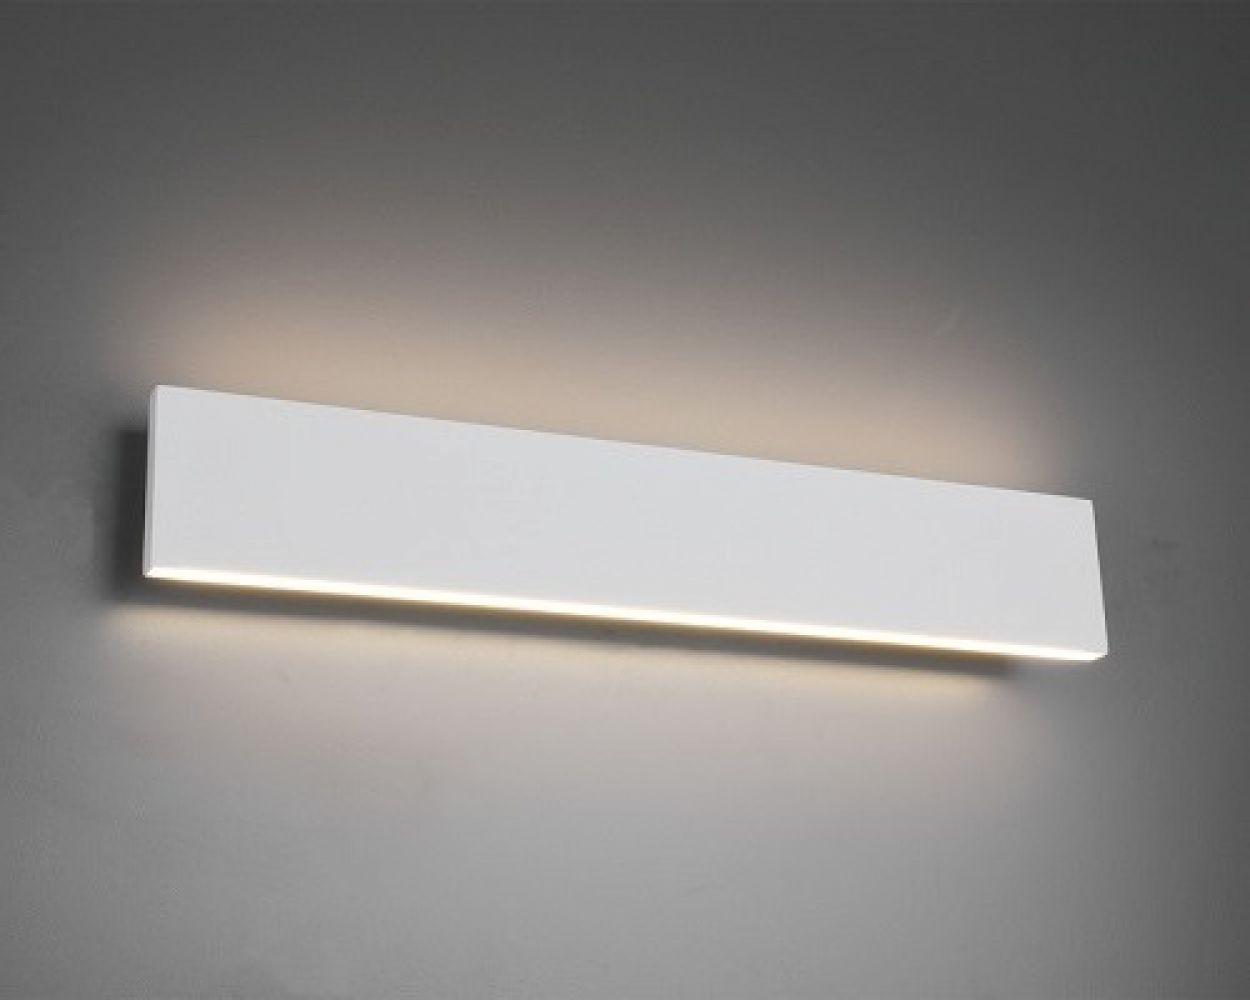 Trio Lighting 004570